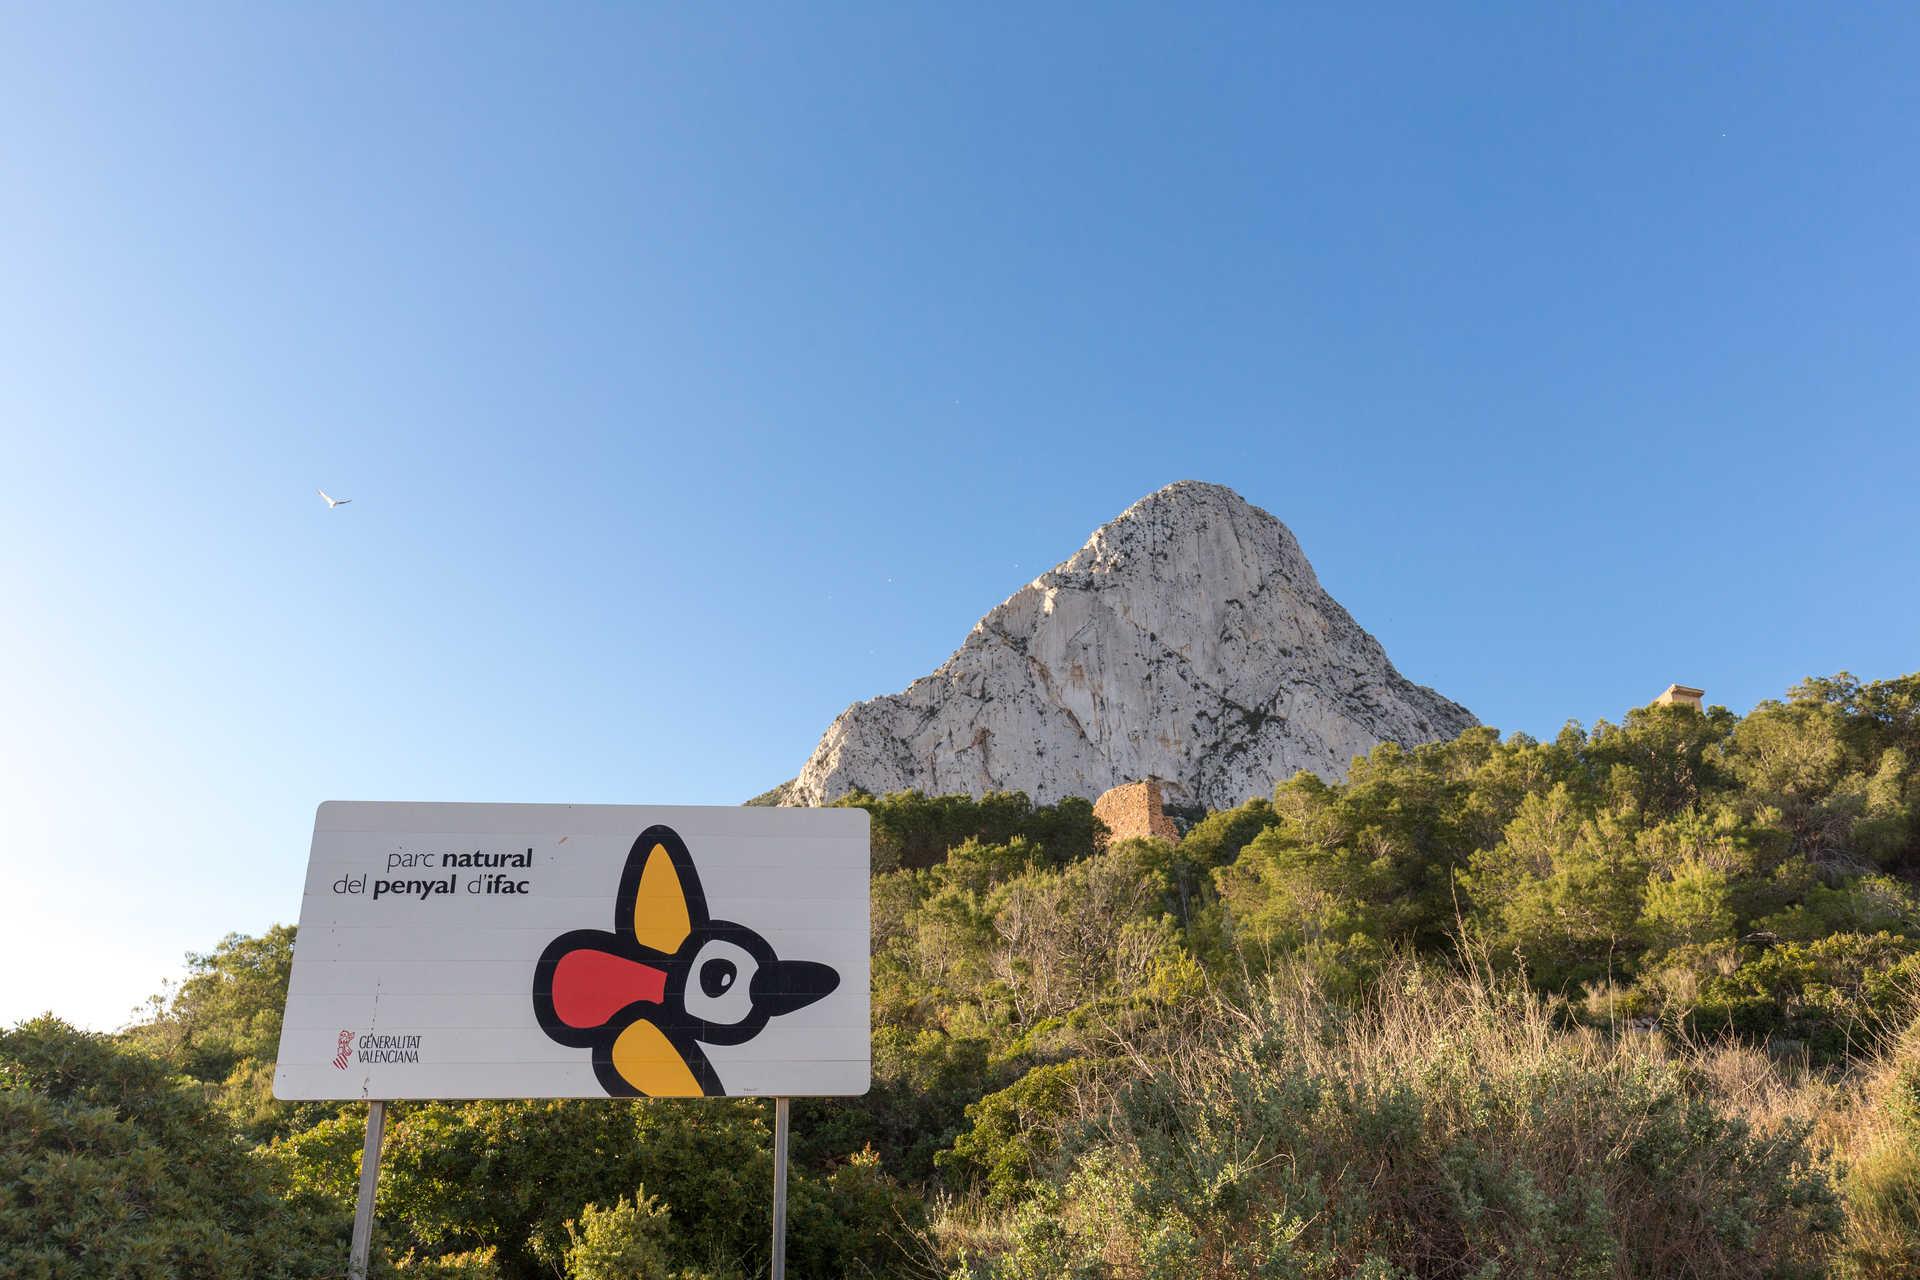 Parc Natural del Penyal d'Ifac